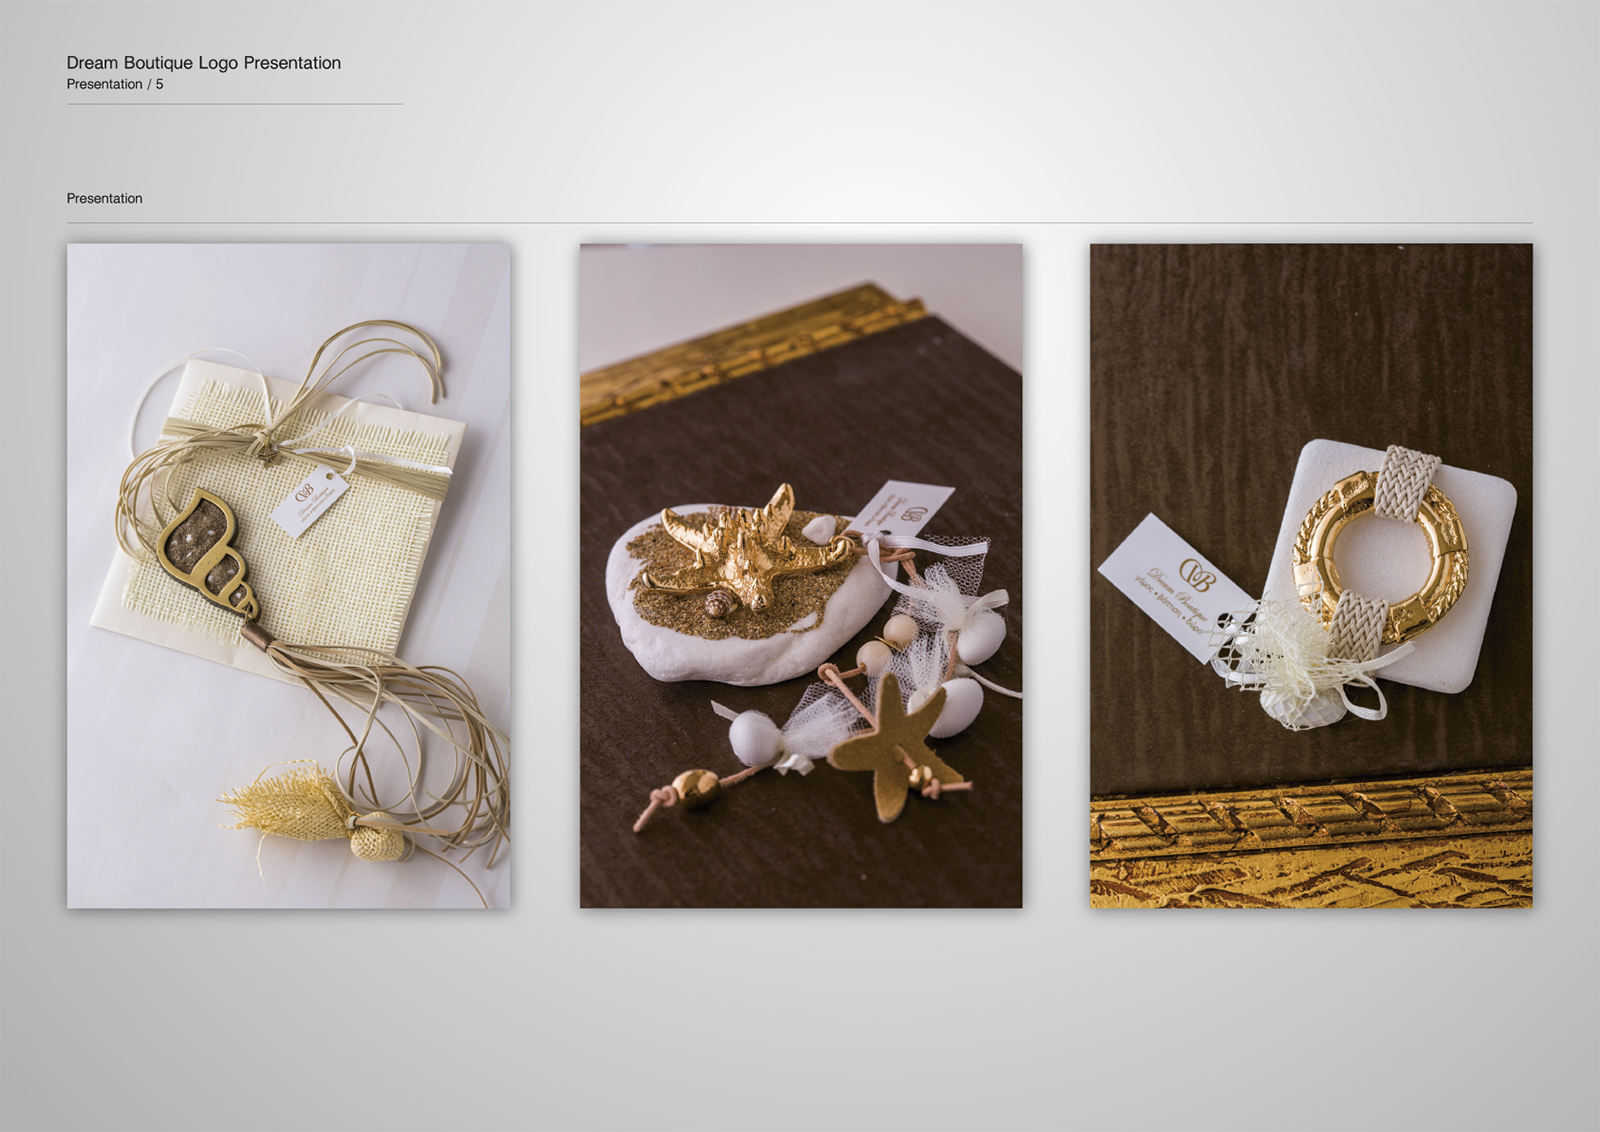 Corporate Identity Dream Boutique_Logo Presentation_5_Yianart